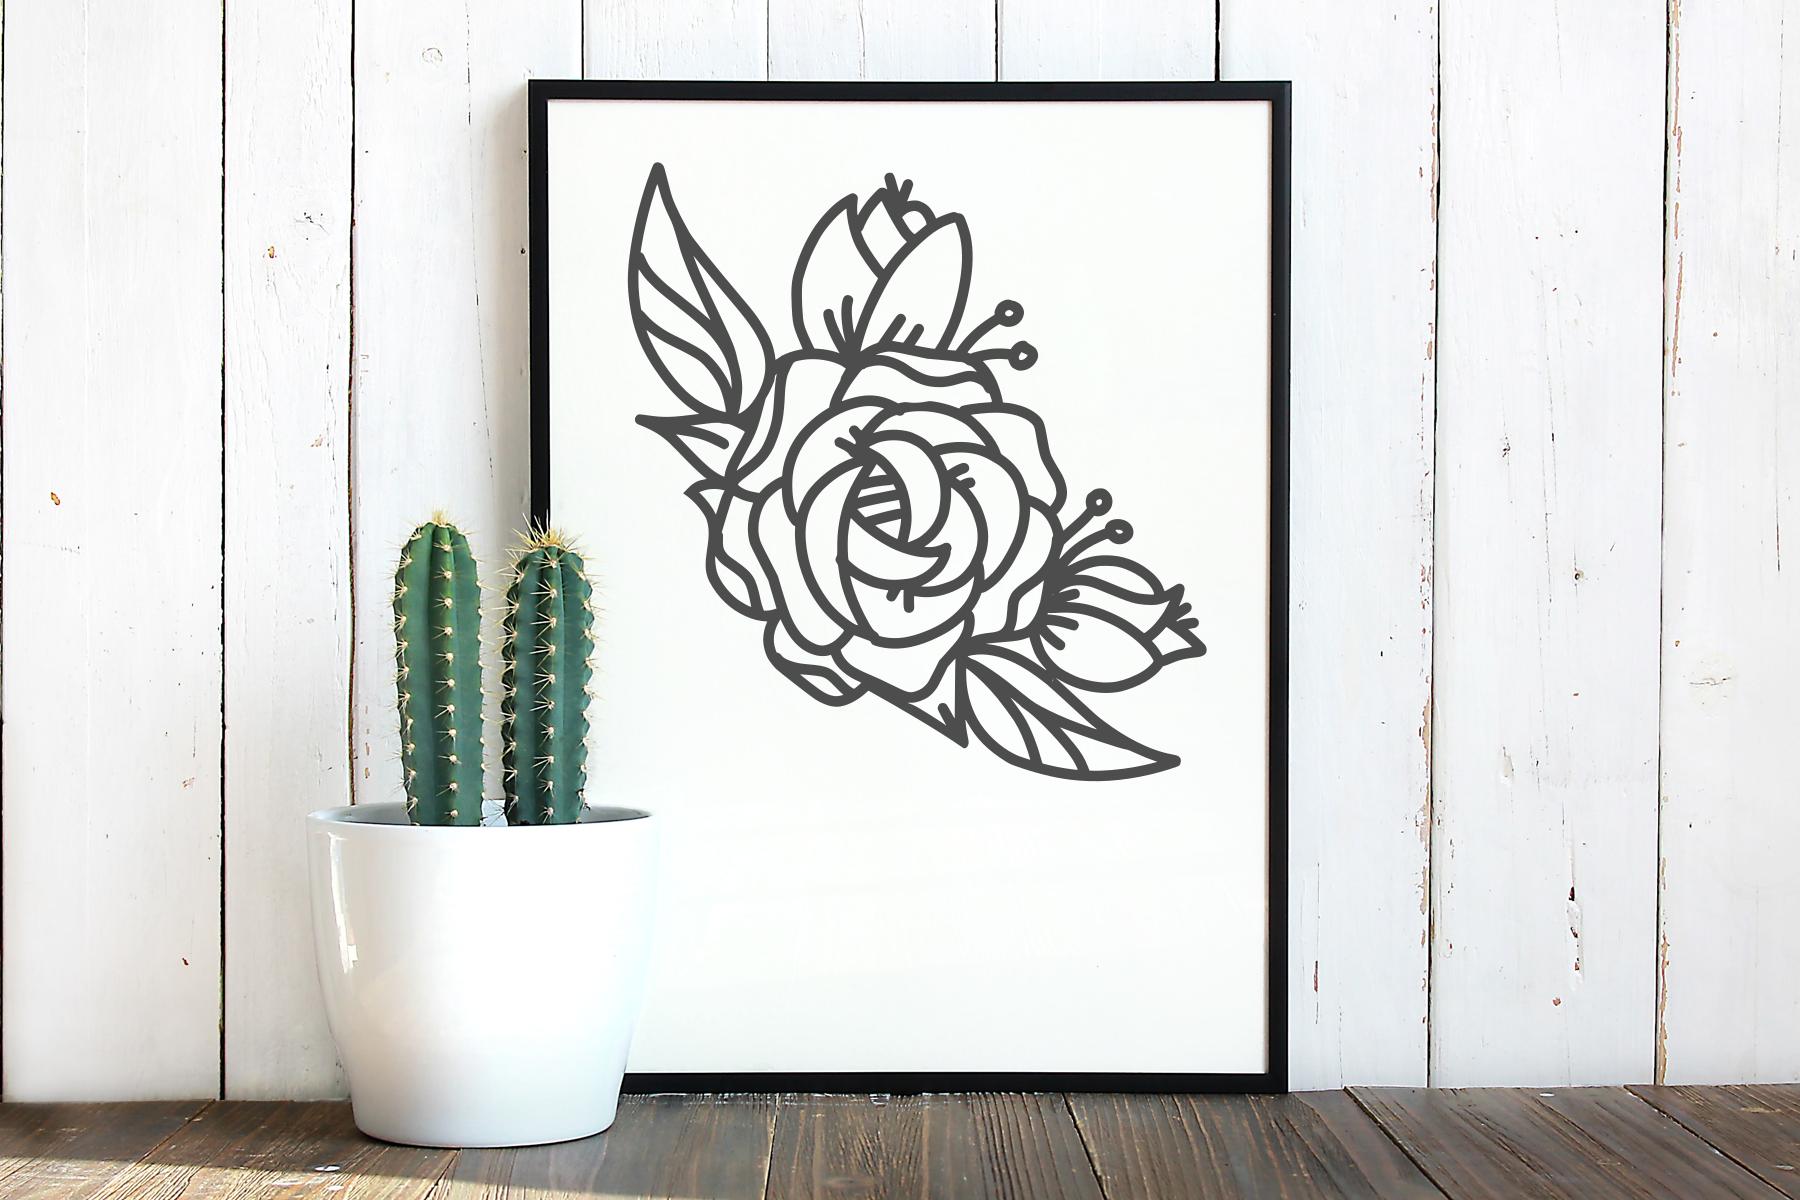 Flower svg, single rose, instant download, cut file example image 2